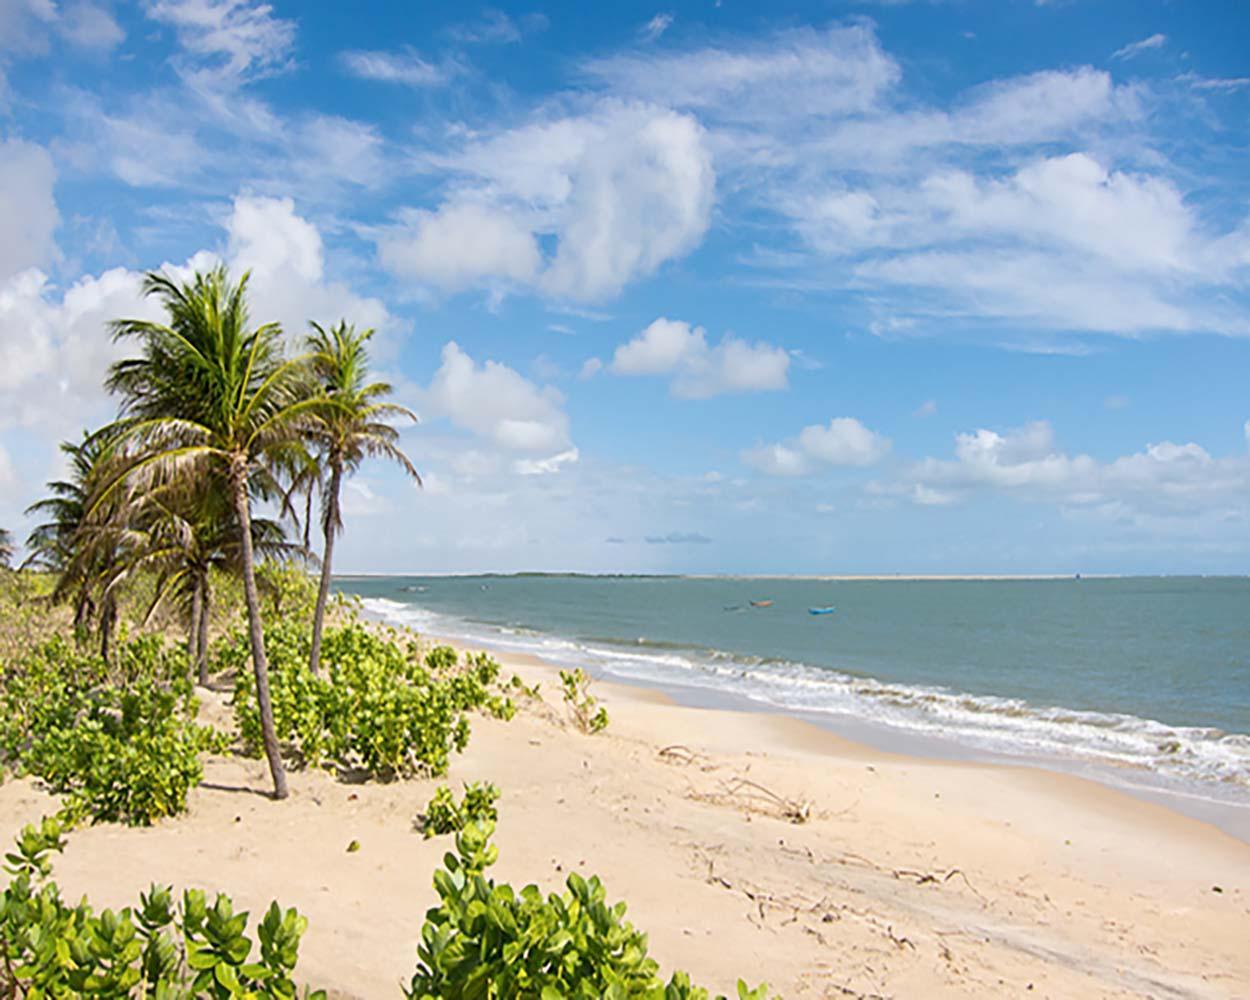 praia deserta no brasil lencóis maranhenses